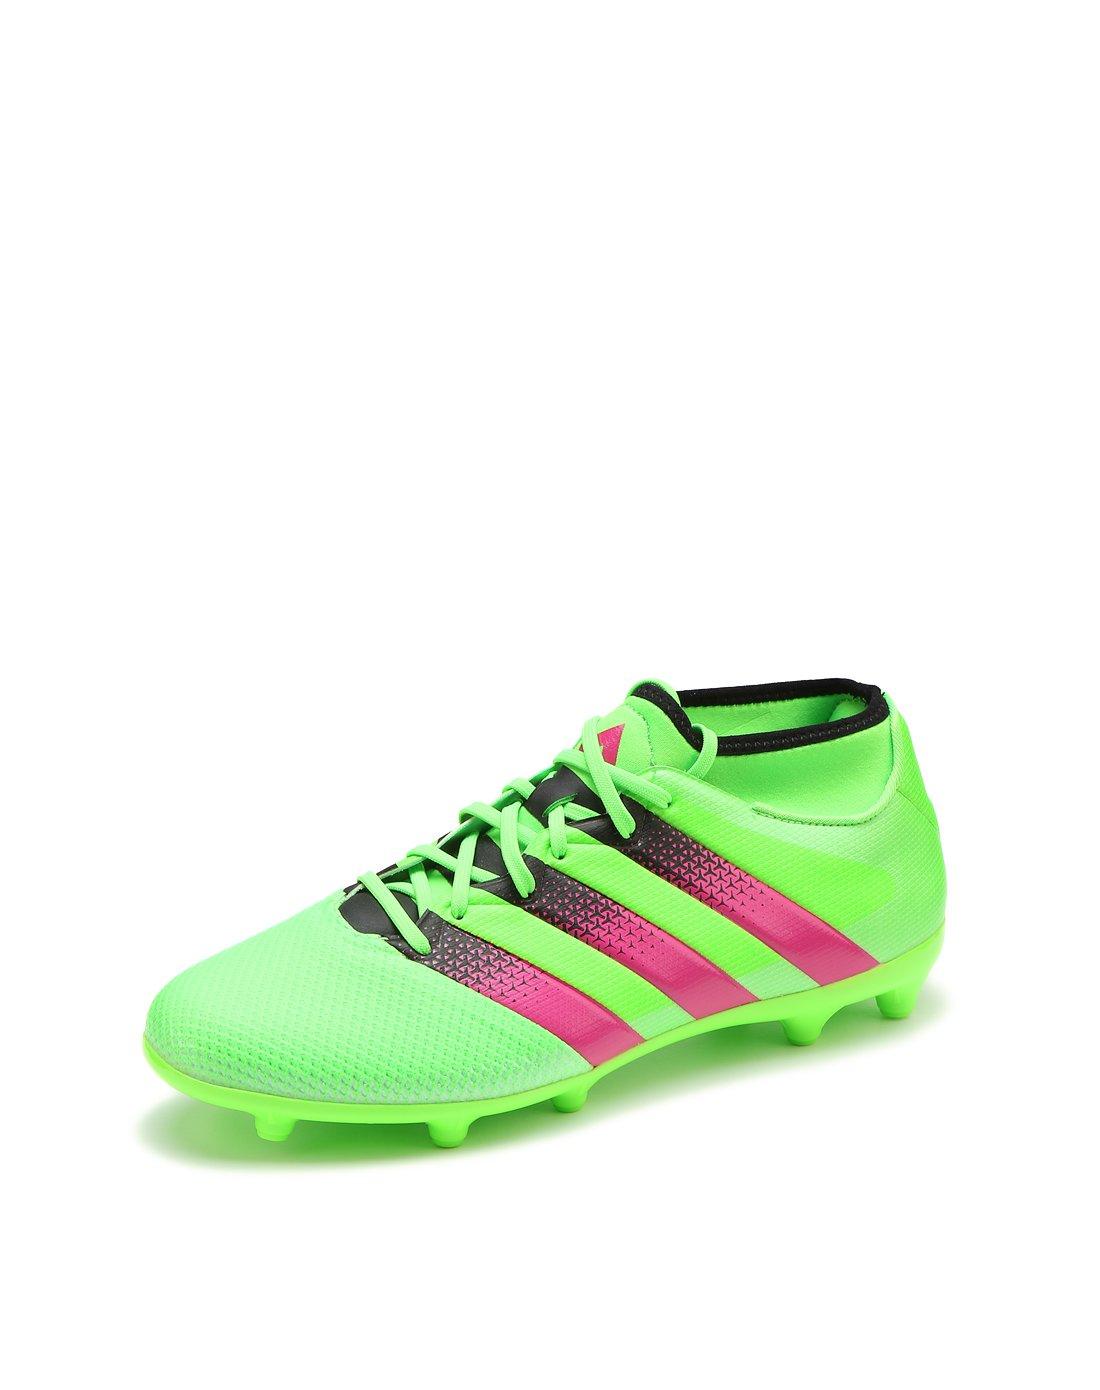 pretty nice a1f7d 99c32 阿迪达斯ACE 16.3 PRIMEMESH FG/AG 男款足球鞋AQ2555_唯品会